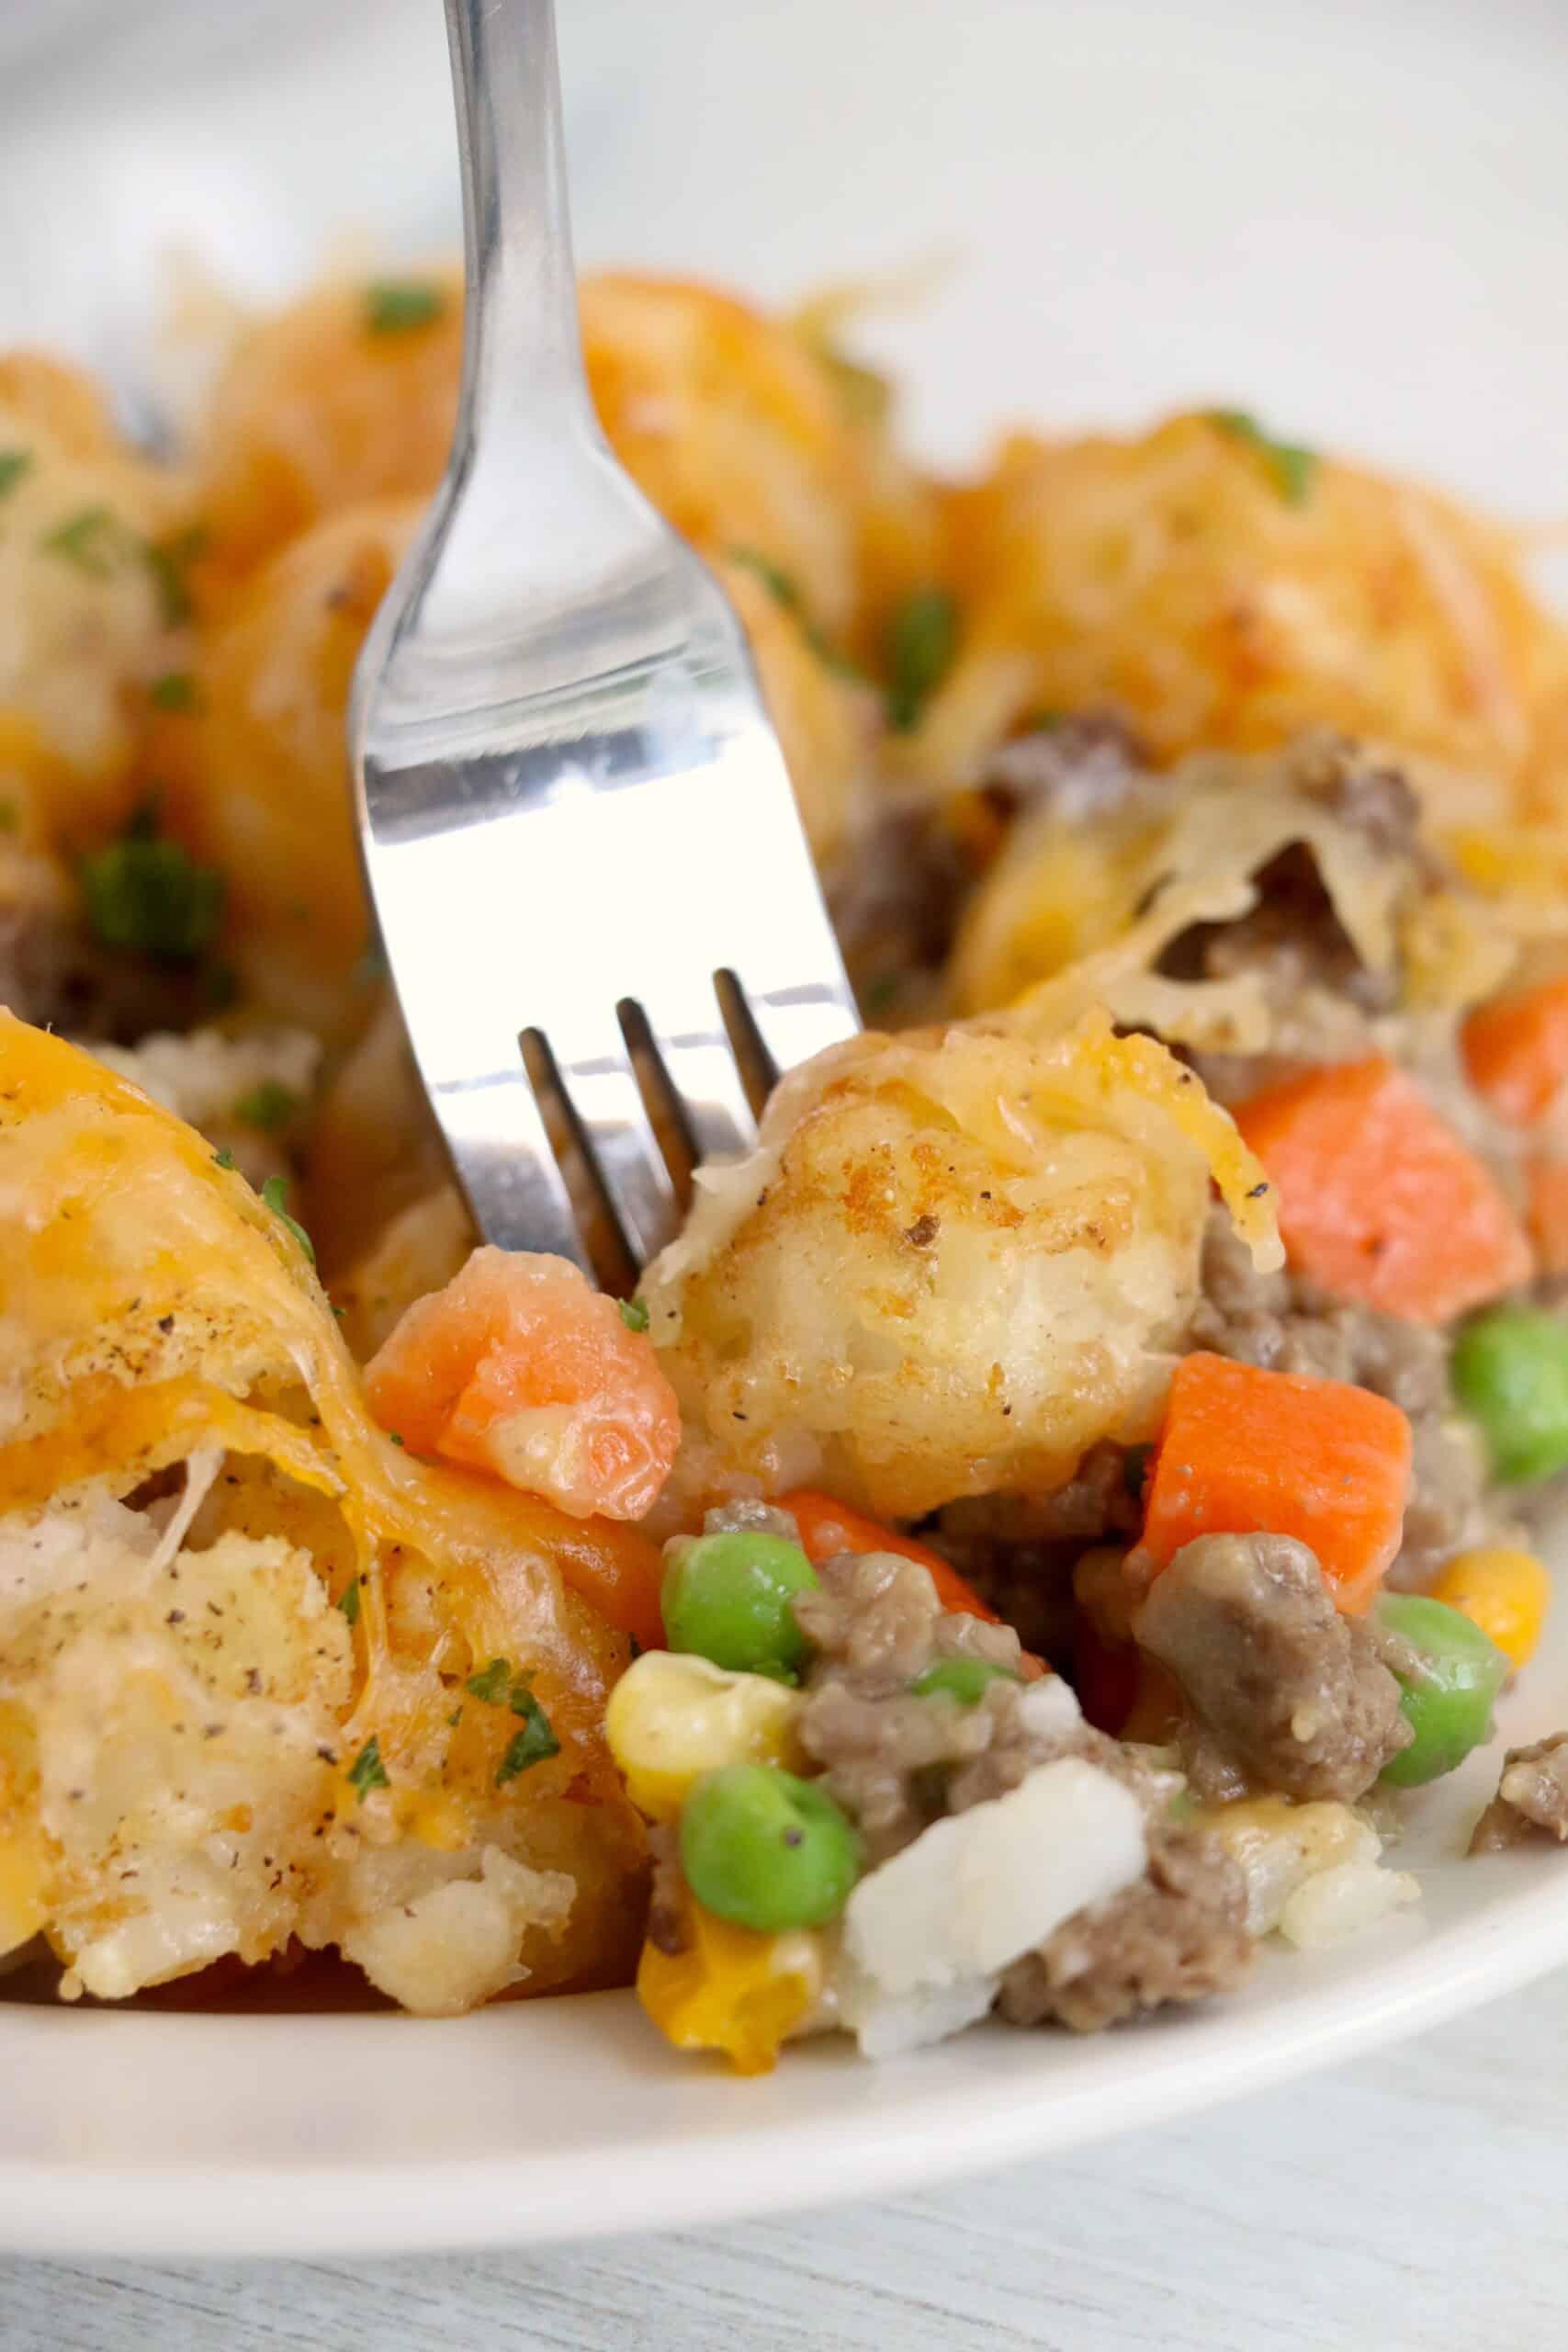 close up of Ninja Foodi Tater Tot Casserole with sliver fork inside.